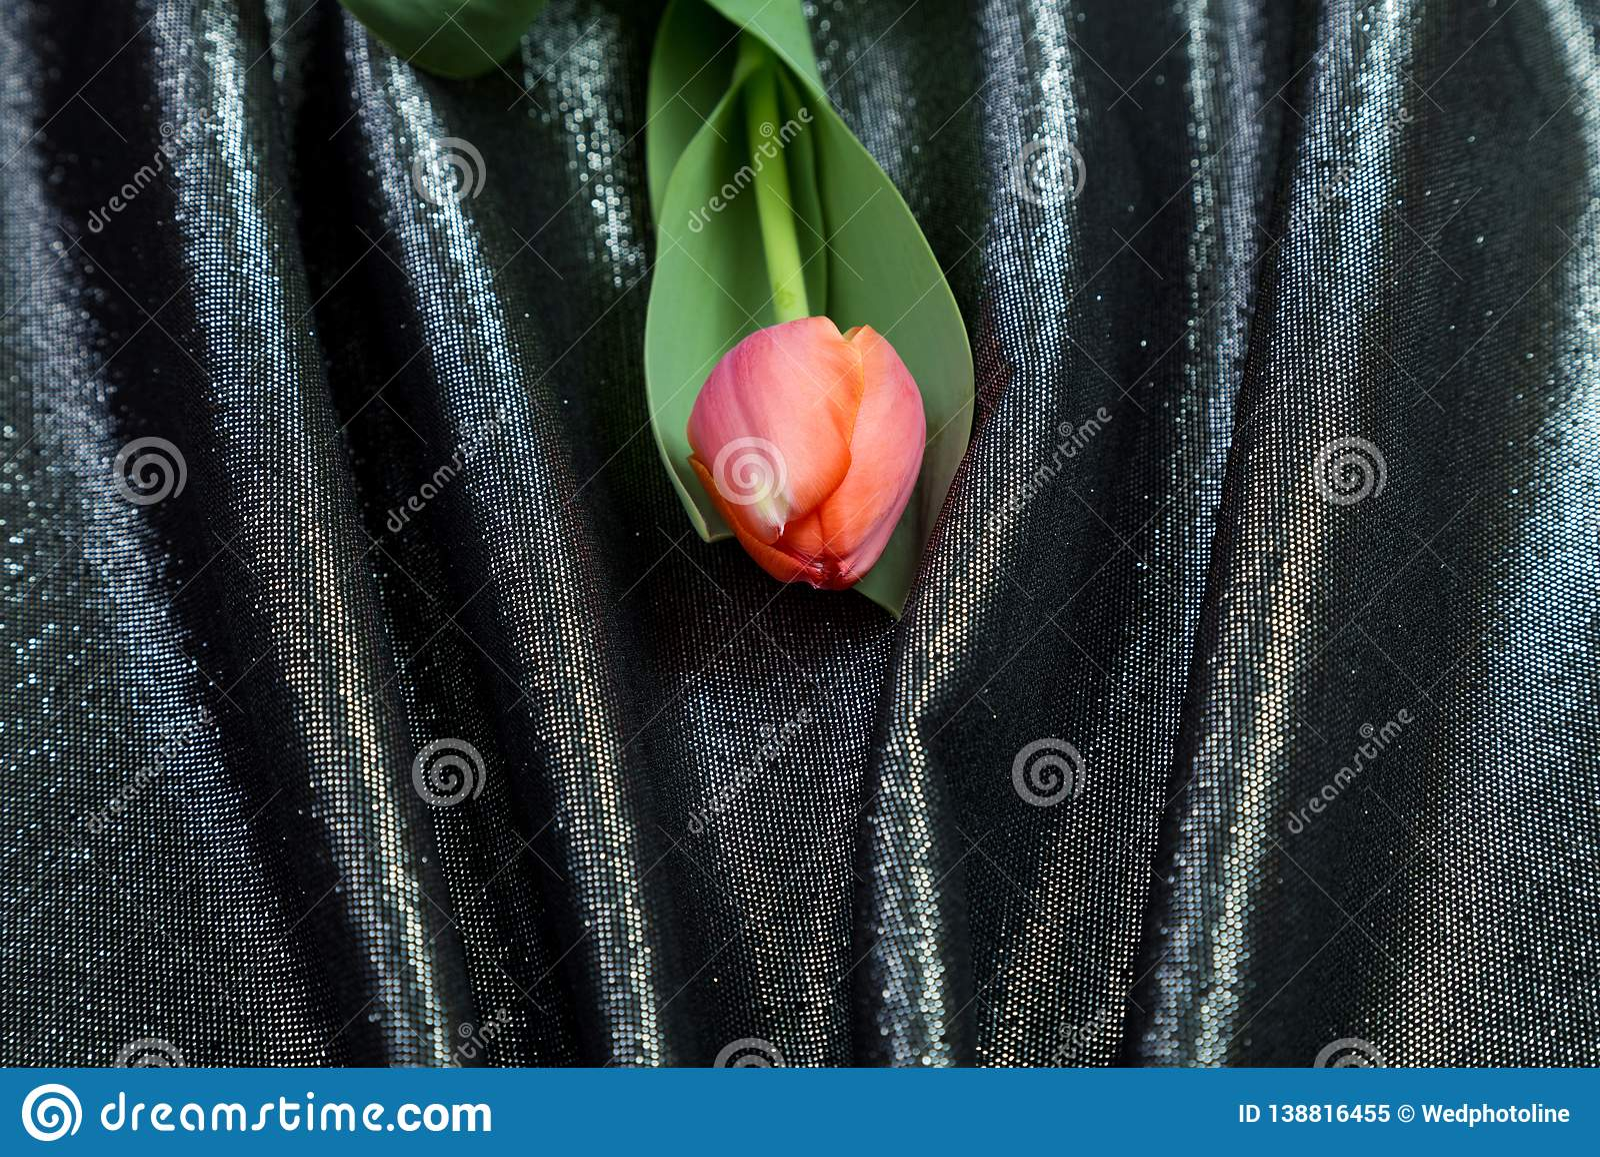 Spring tender pink tulips on brocade fabric